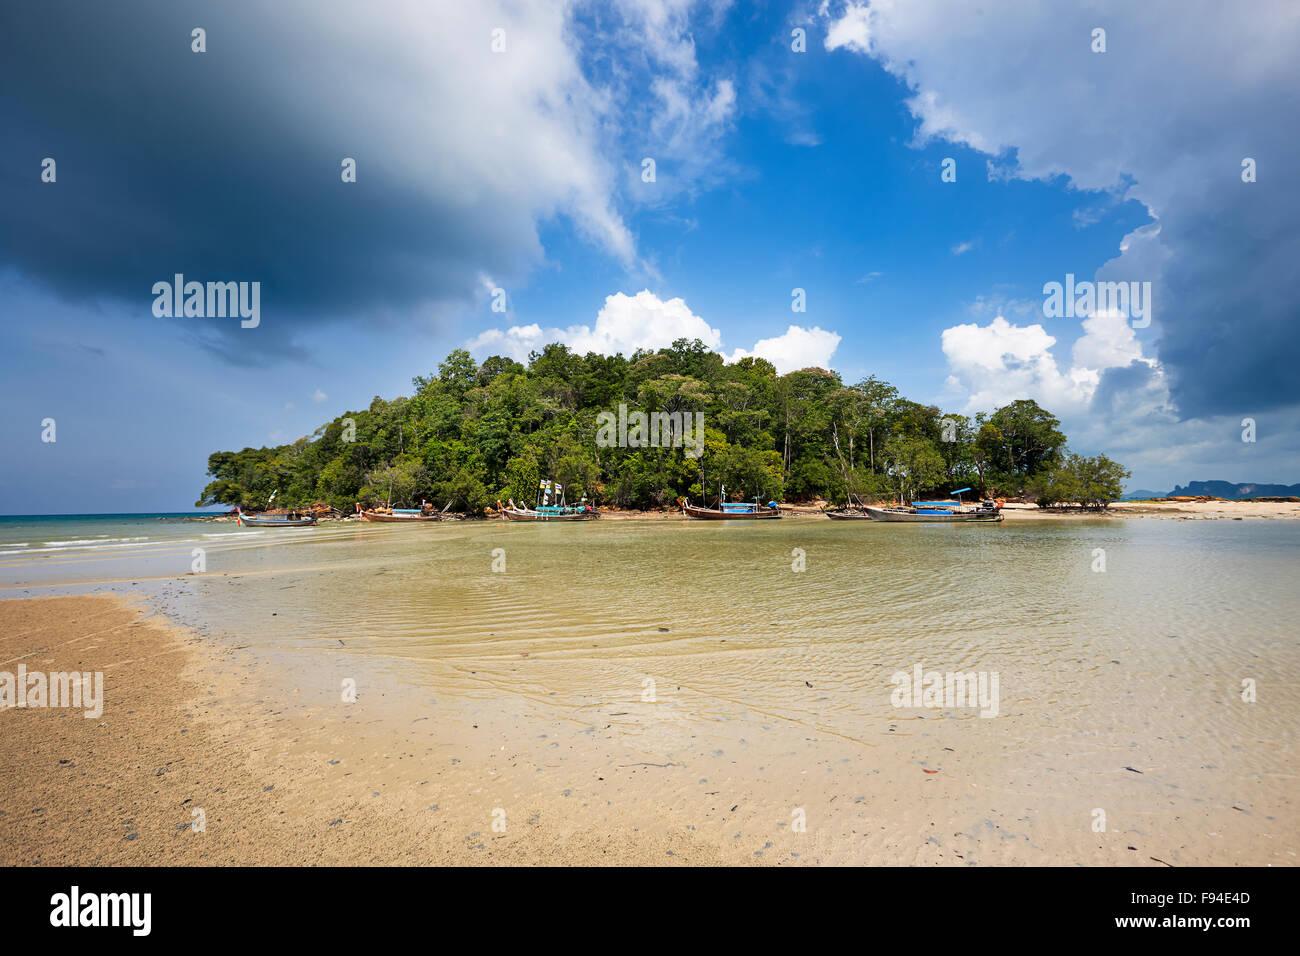 Klong Muang Beach, Krabi Province, Thailand. - Stock Image